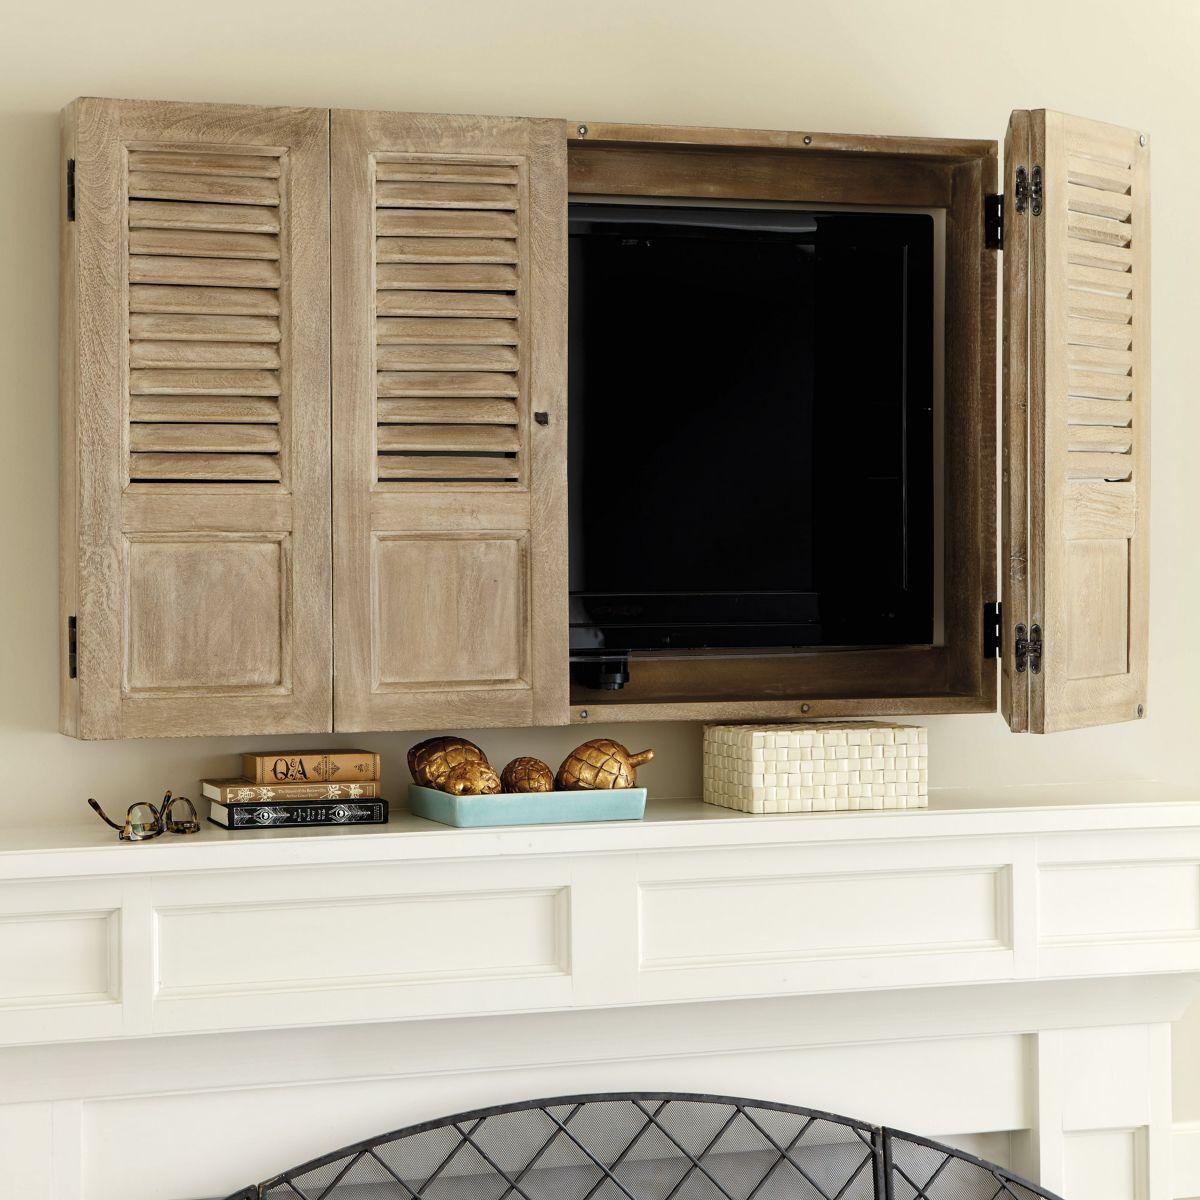 Mounted TV shutters